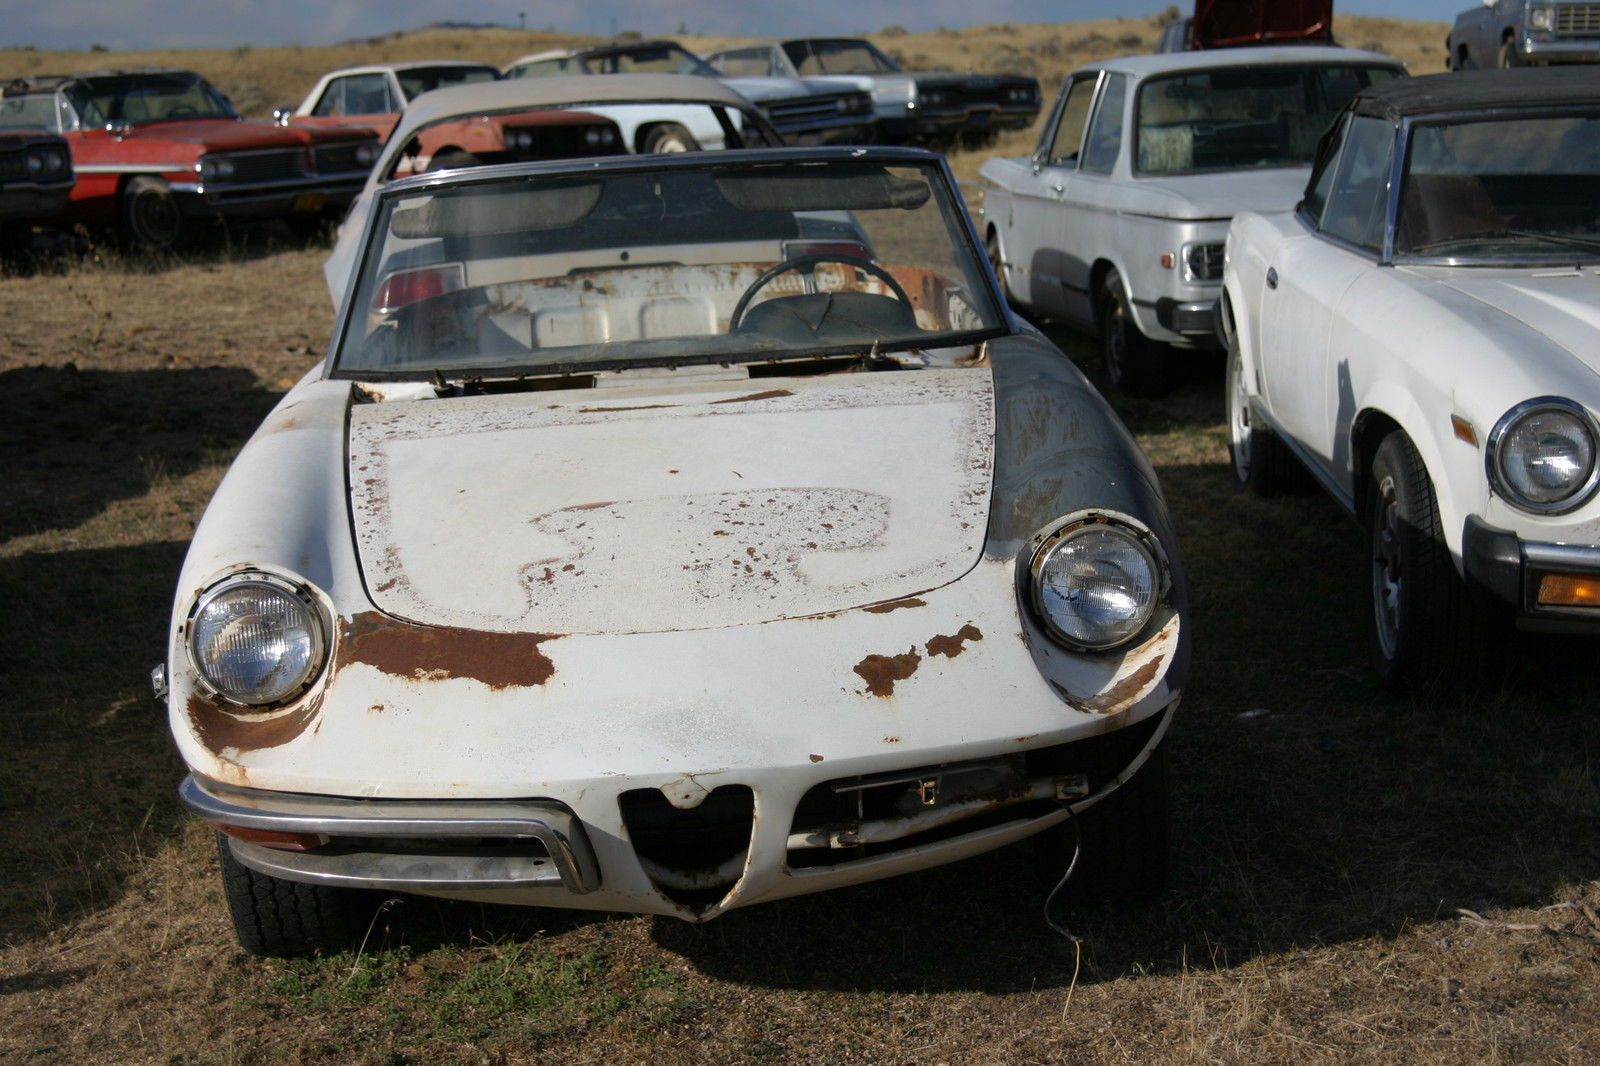 1969 alfa romeo duetto spiders 2 complete cars along. Black Bedroom Furniture Sets. Home Design Ideas